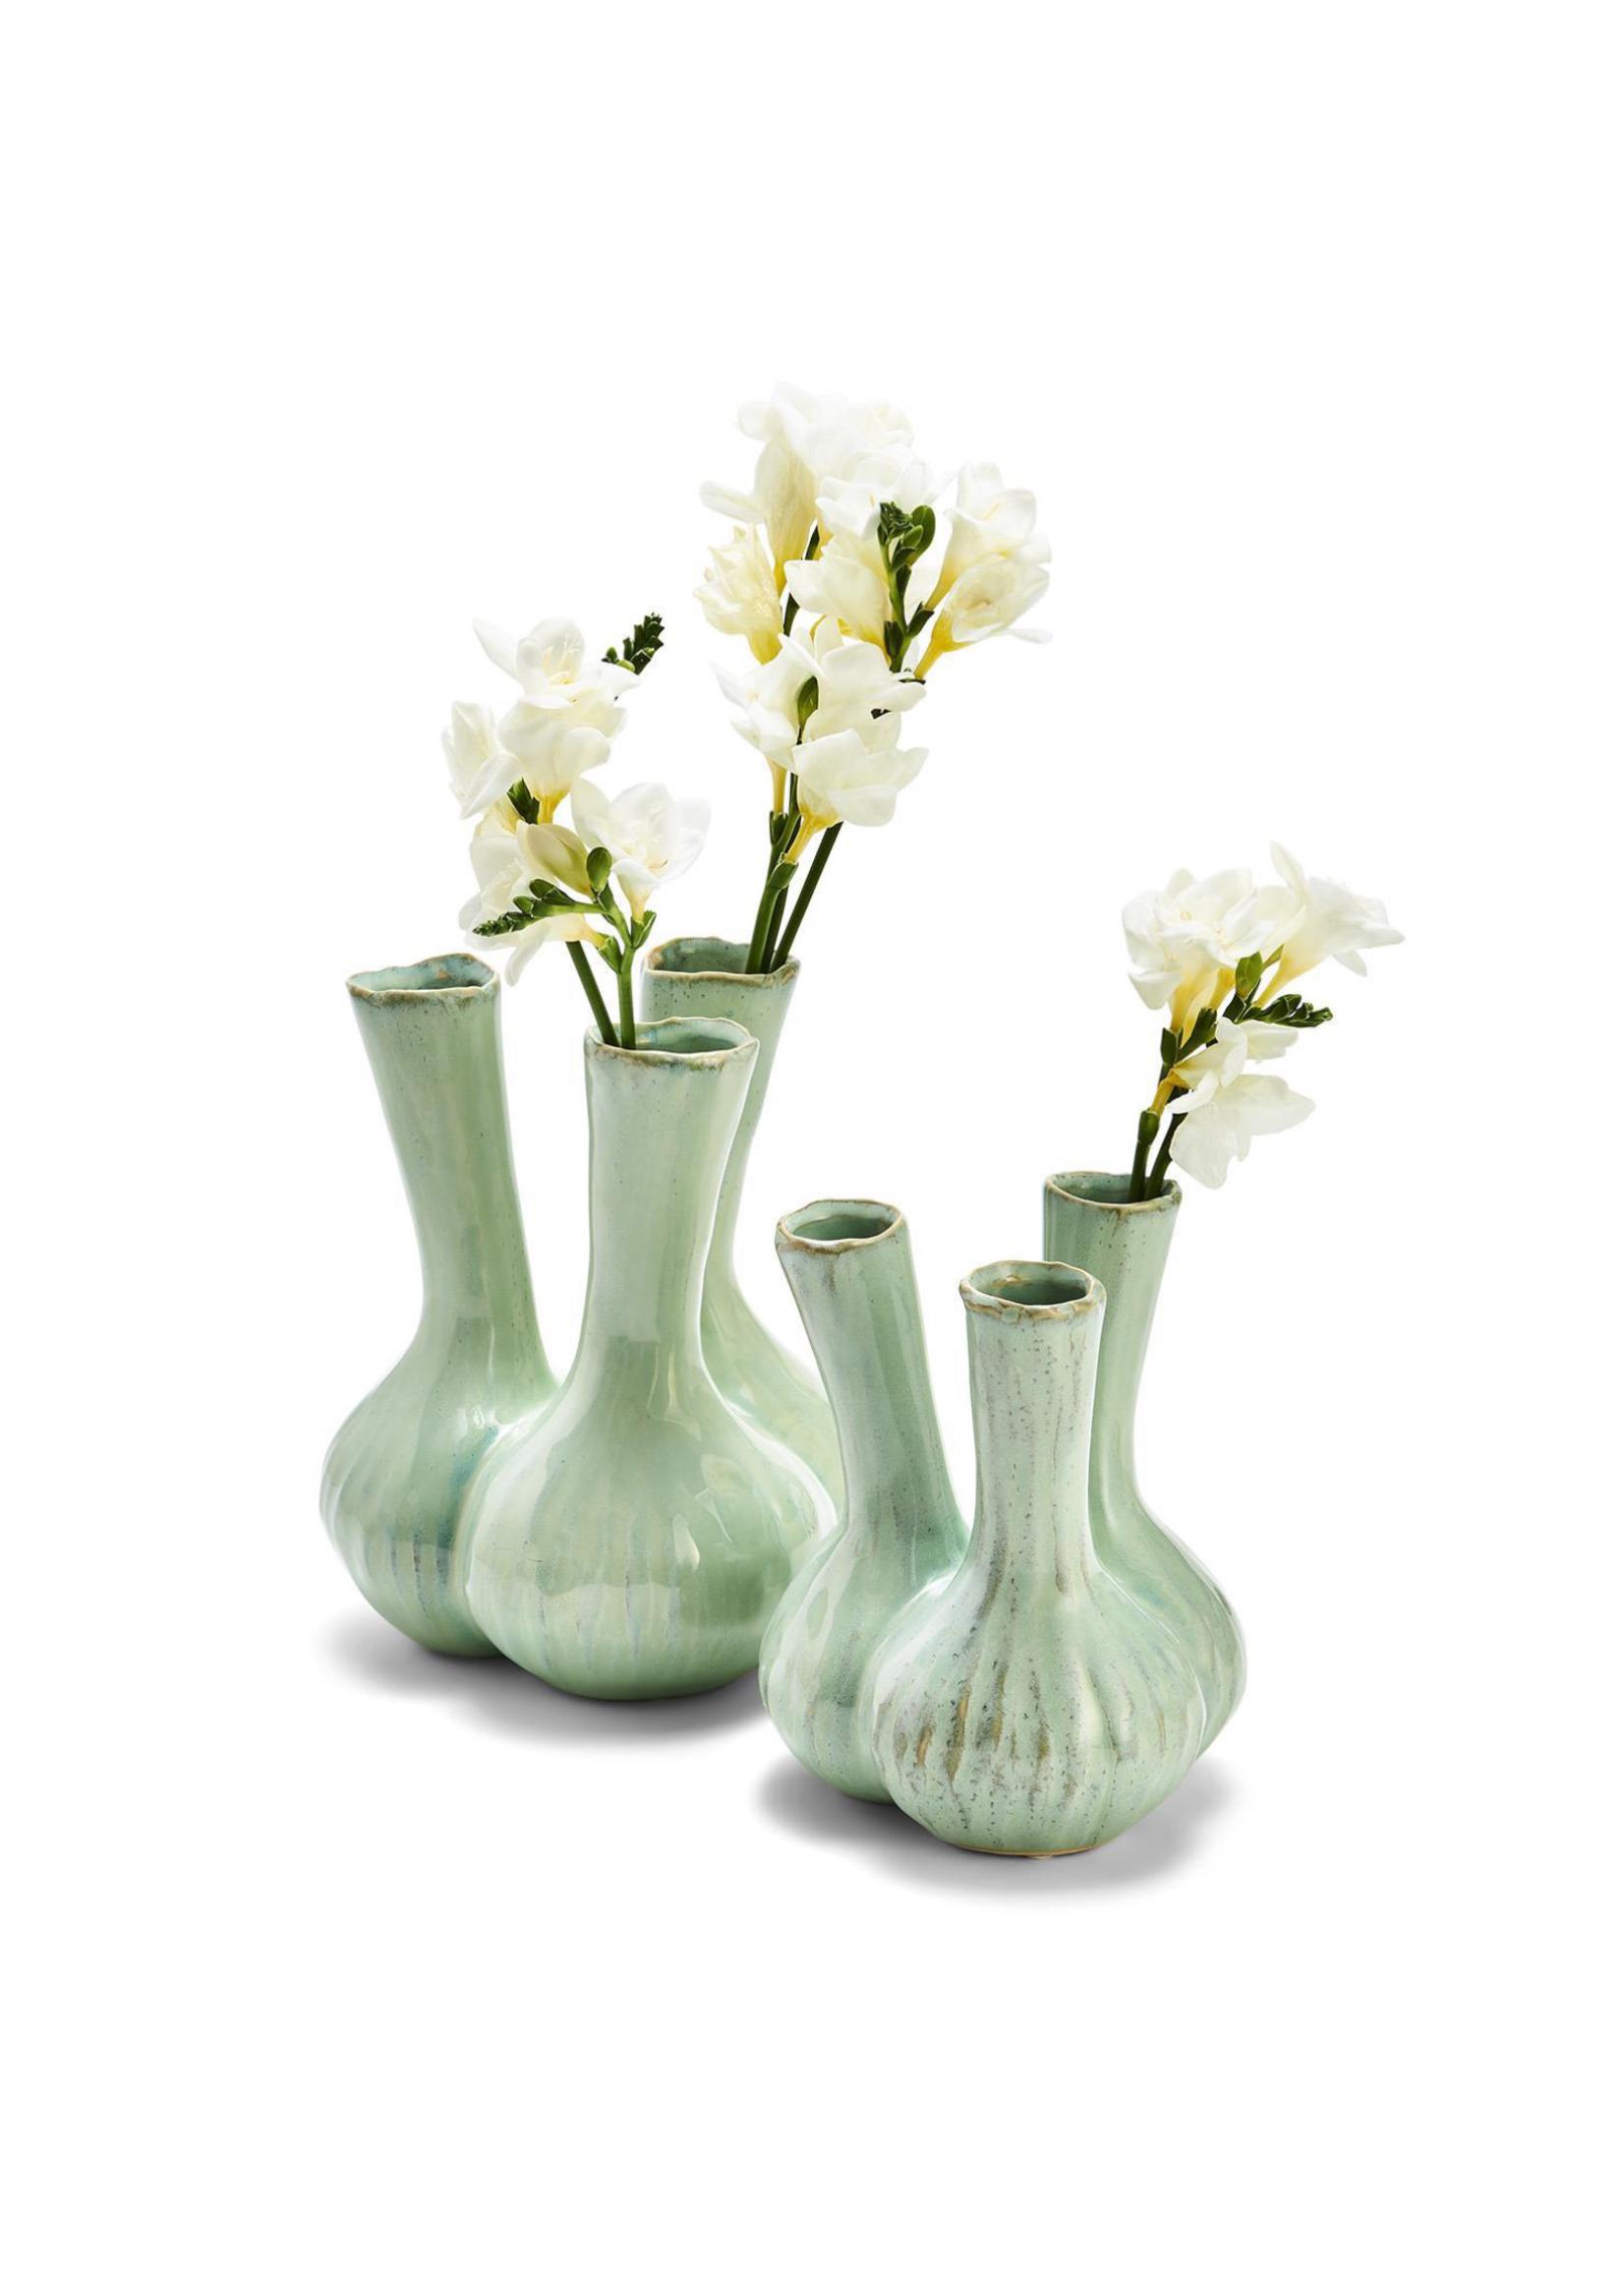 Two's Company, Inc. Celadon 3 Stem Vase Large